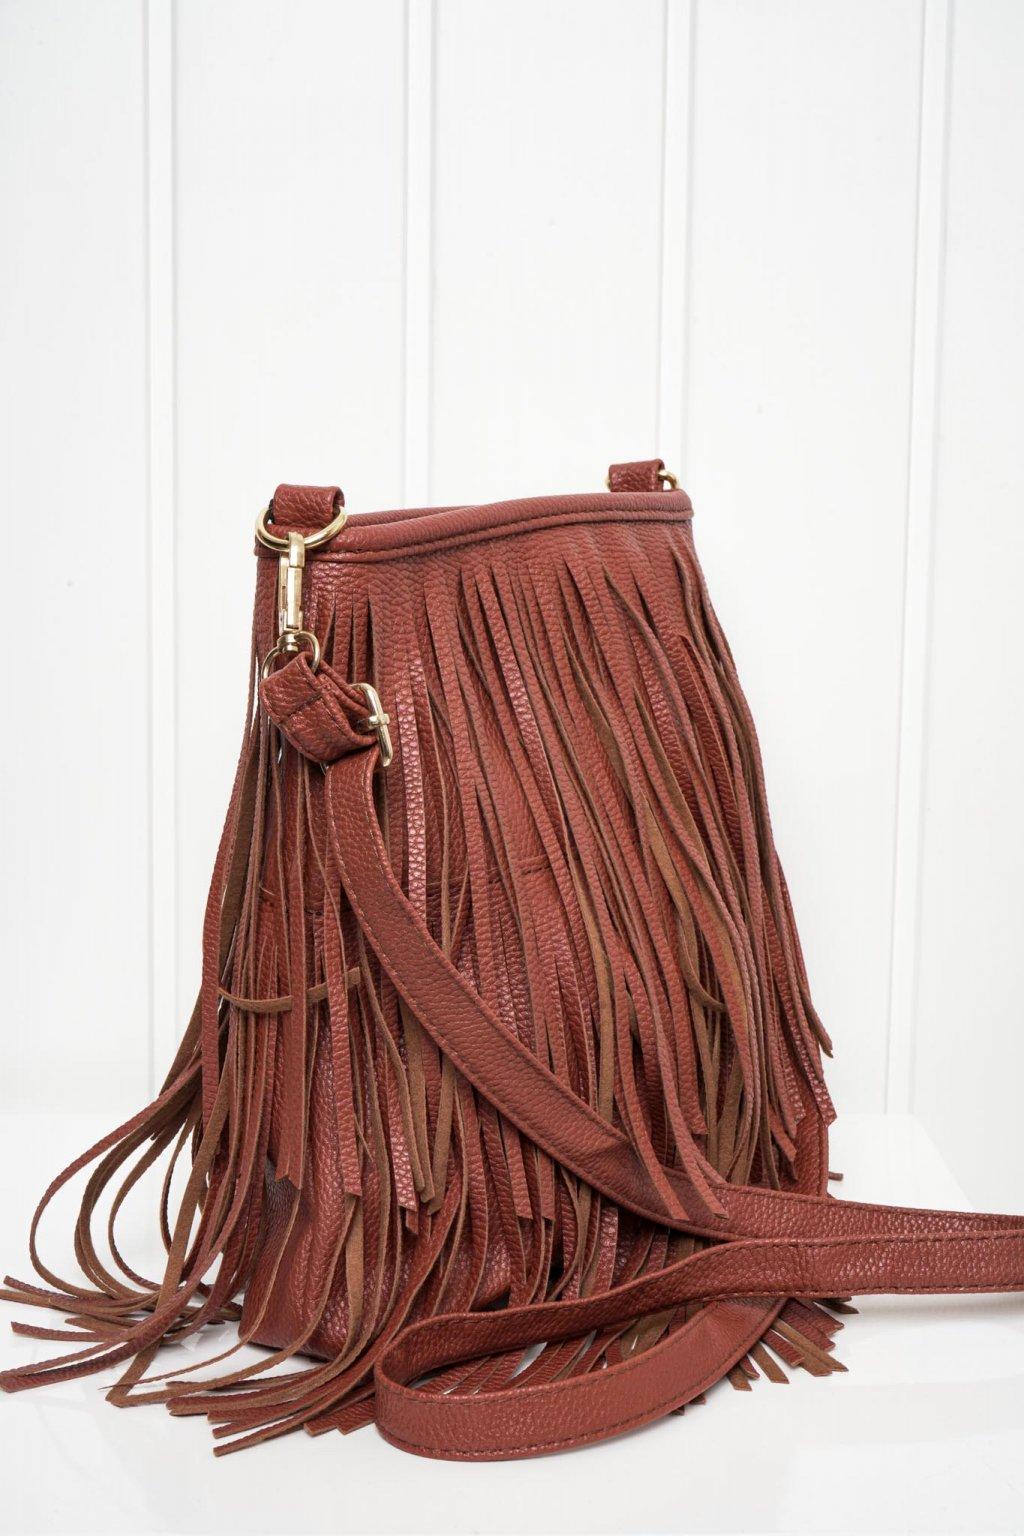 Kabelka, crossbody, ruksak, shopping bag, shopperka, 328